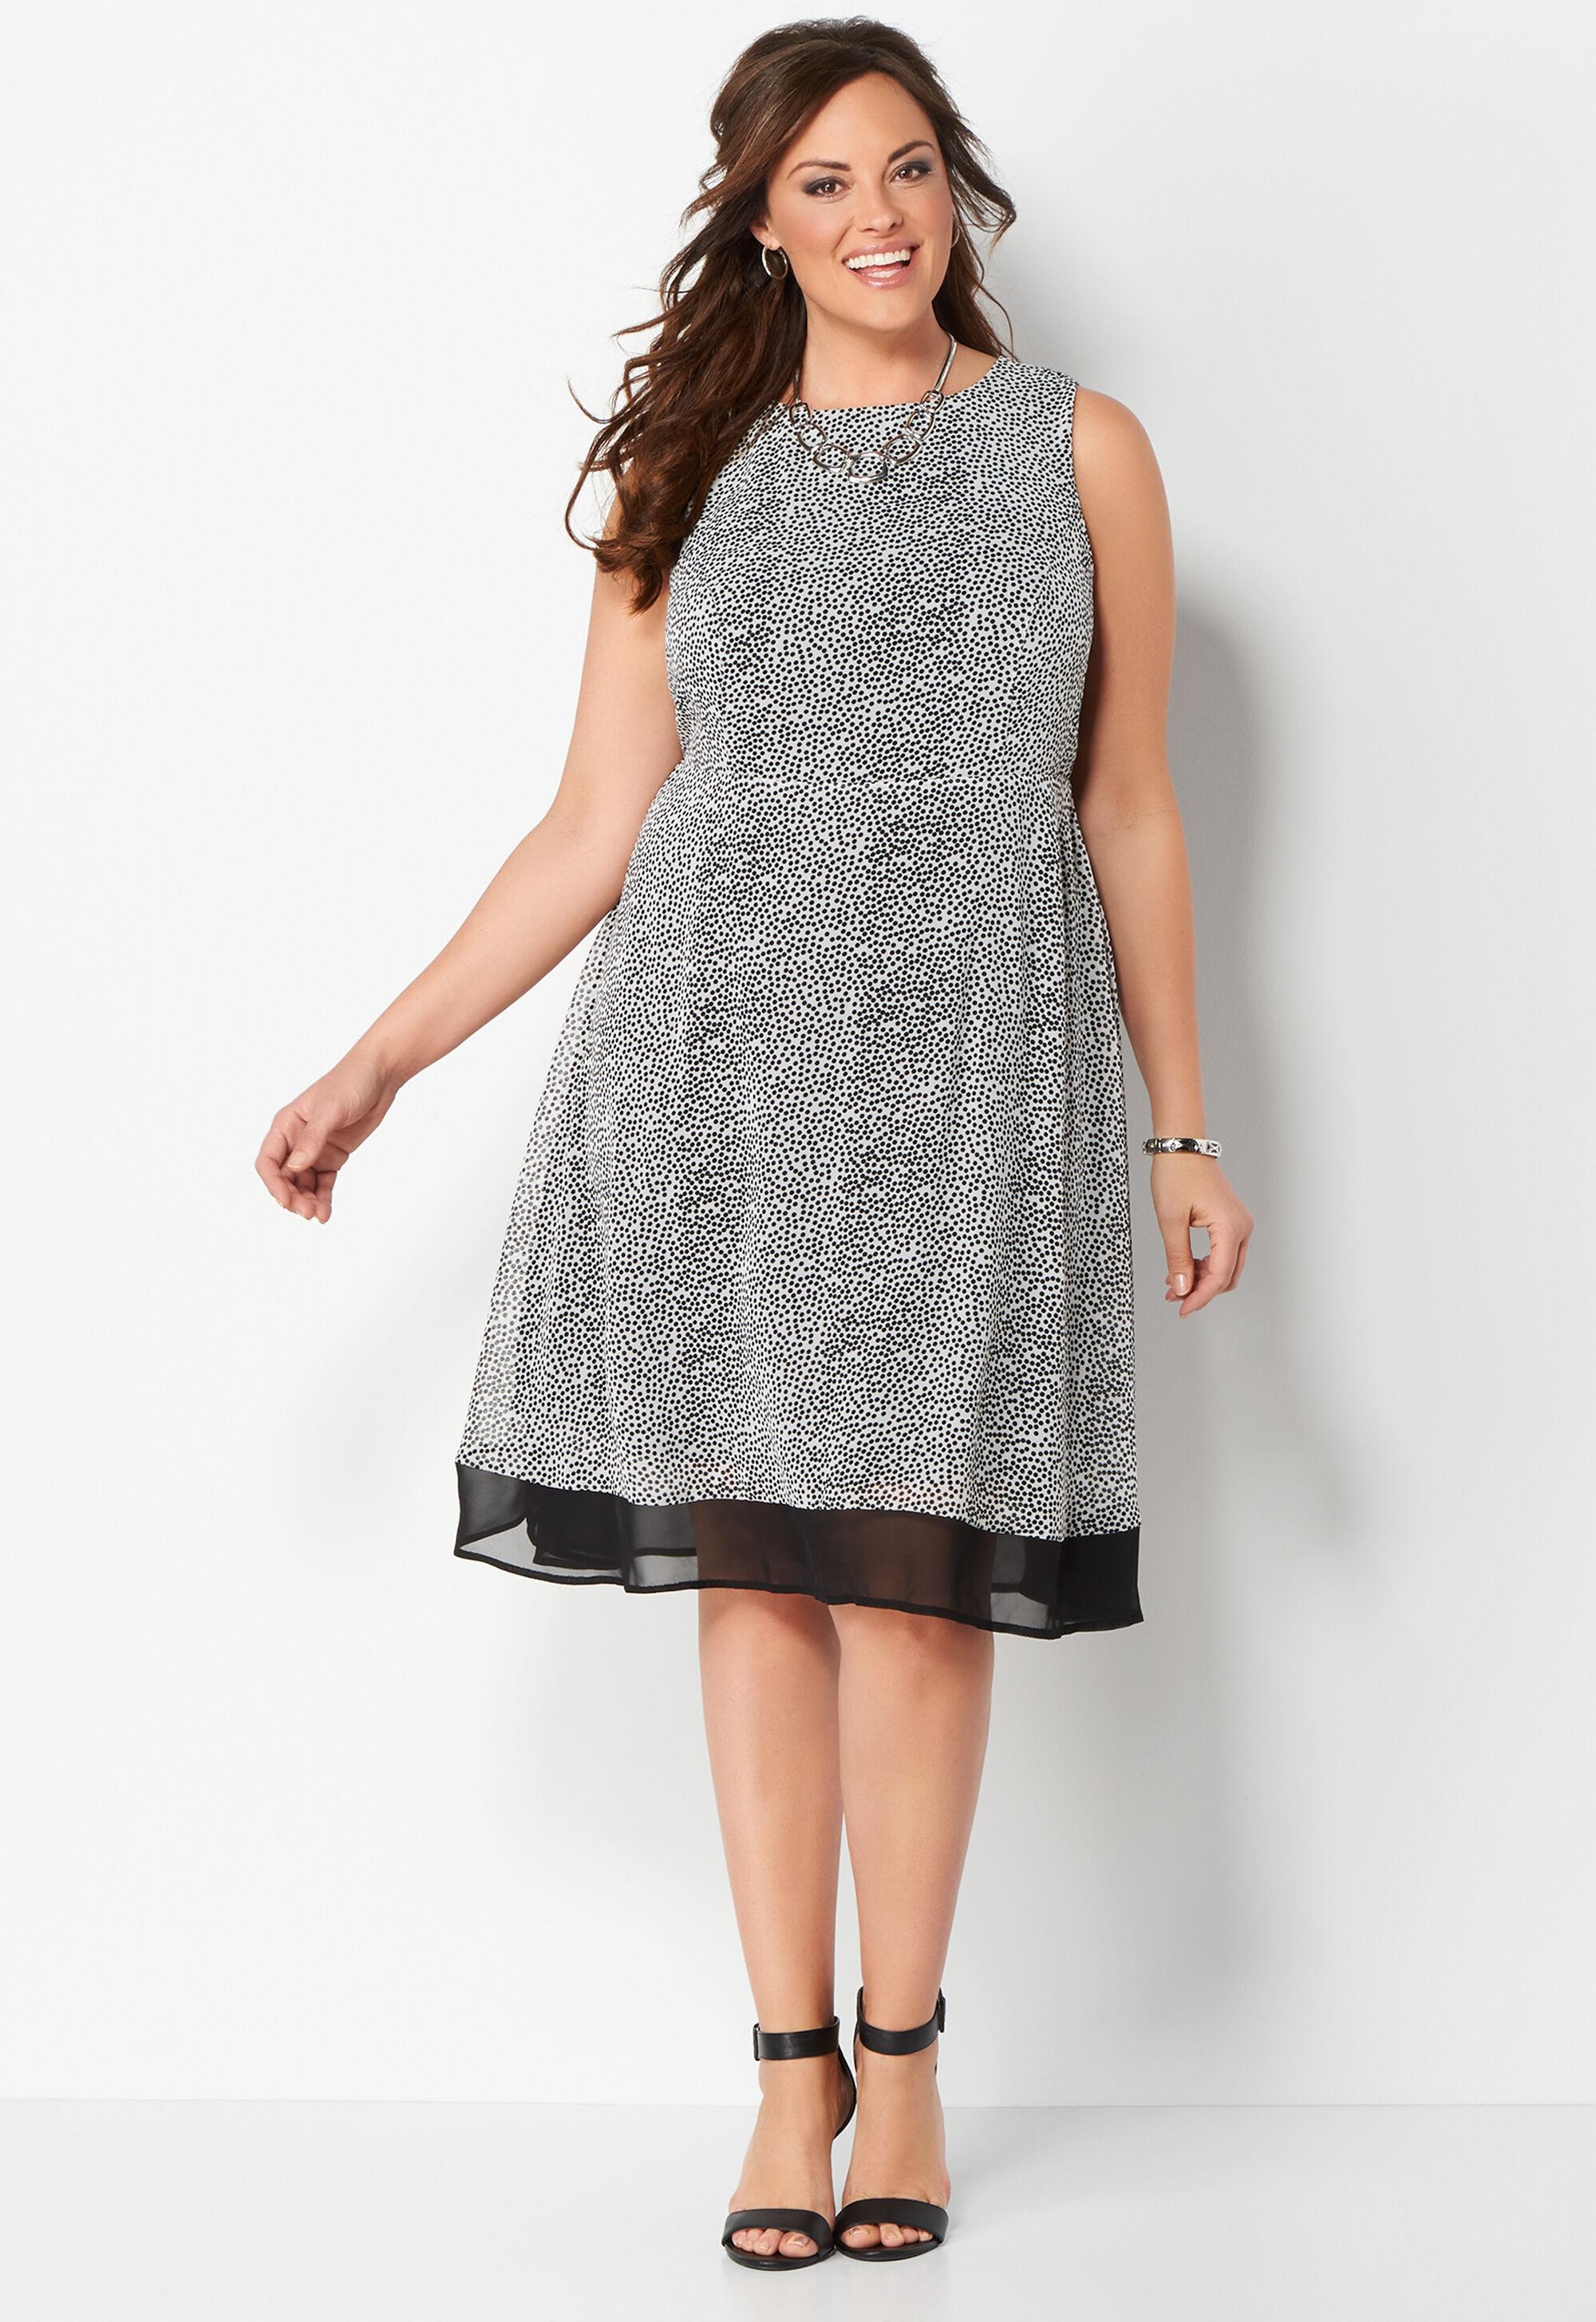 Polka Dot Cocktail Dresses